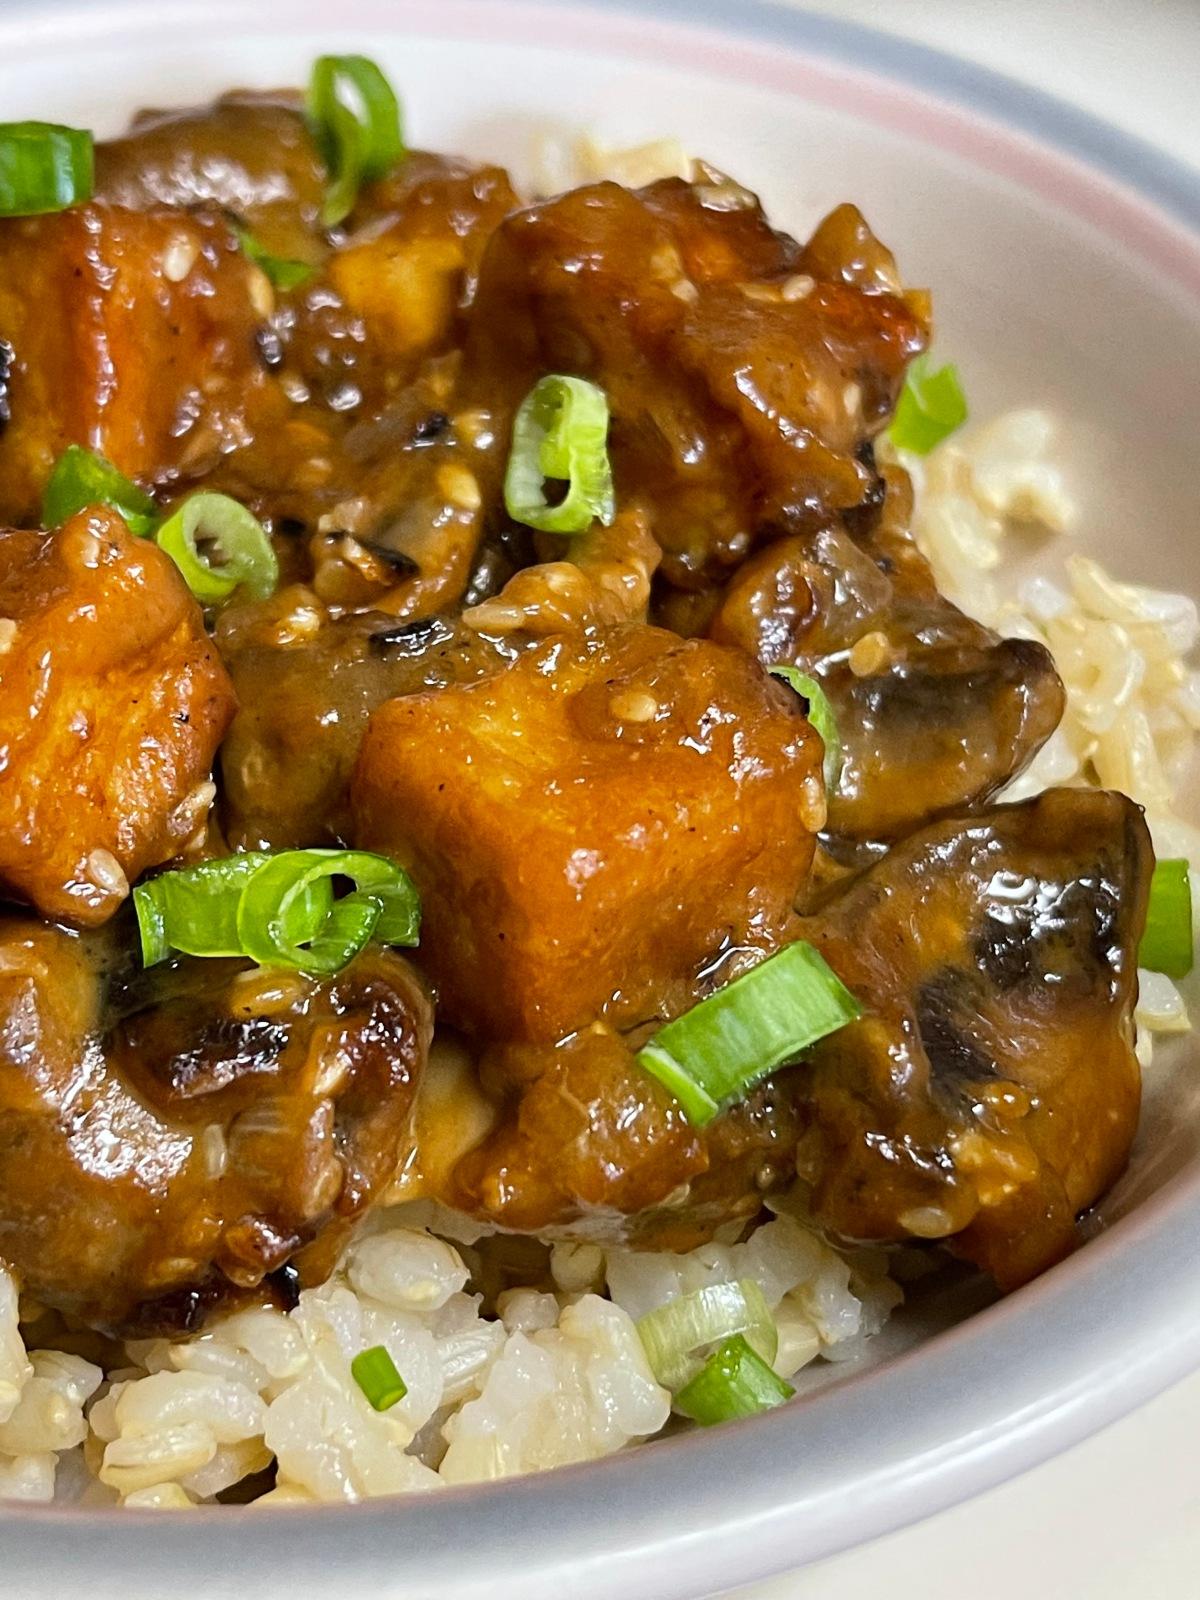 Stir-Fried Tofu with PeanutSauce